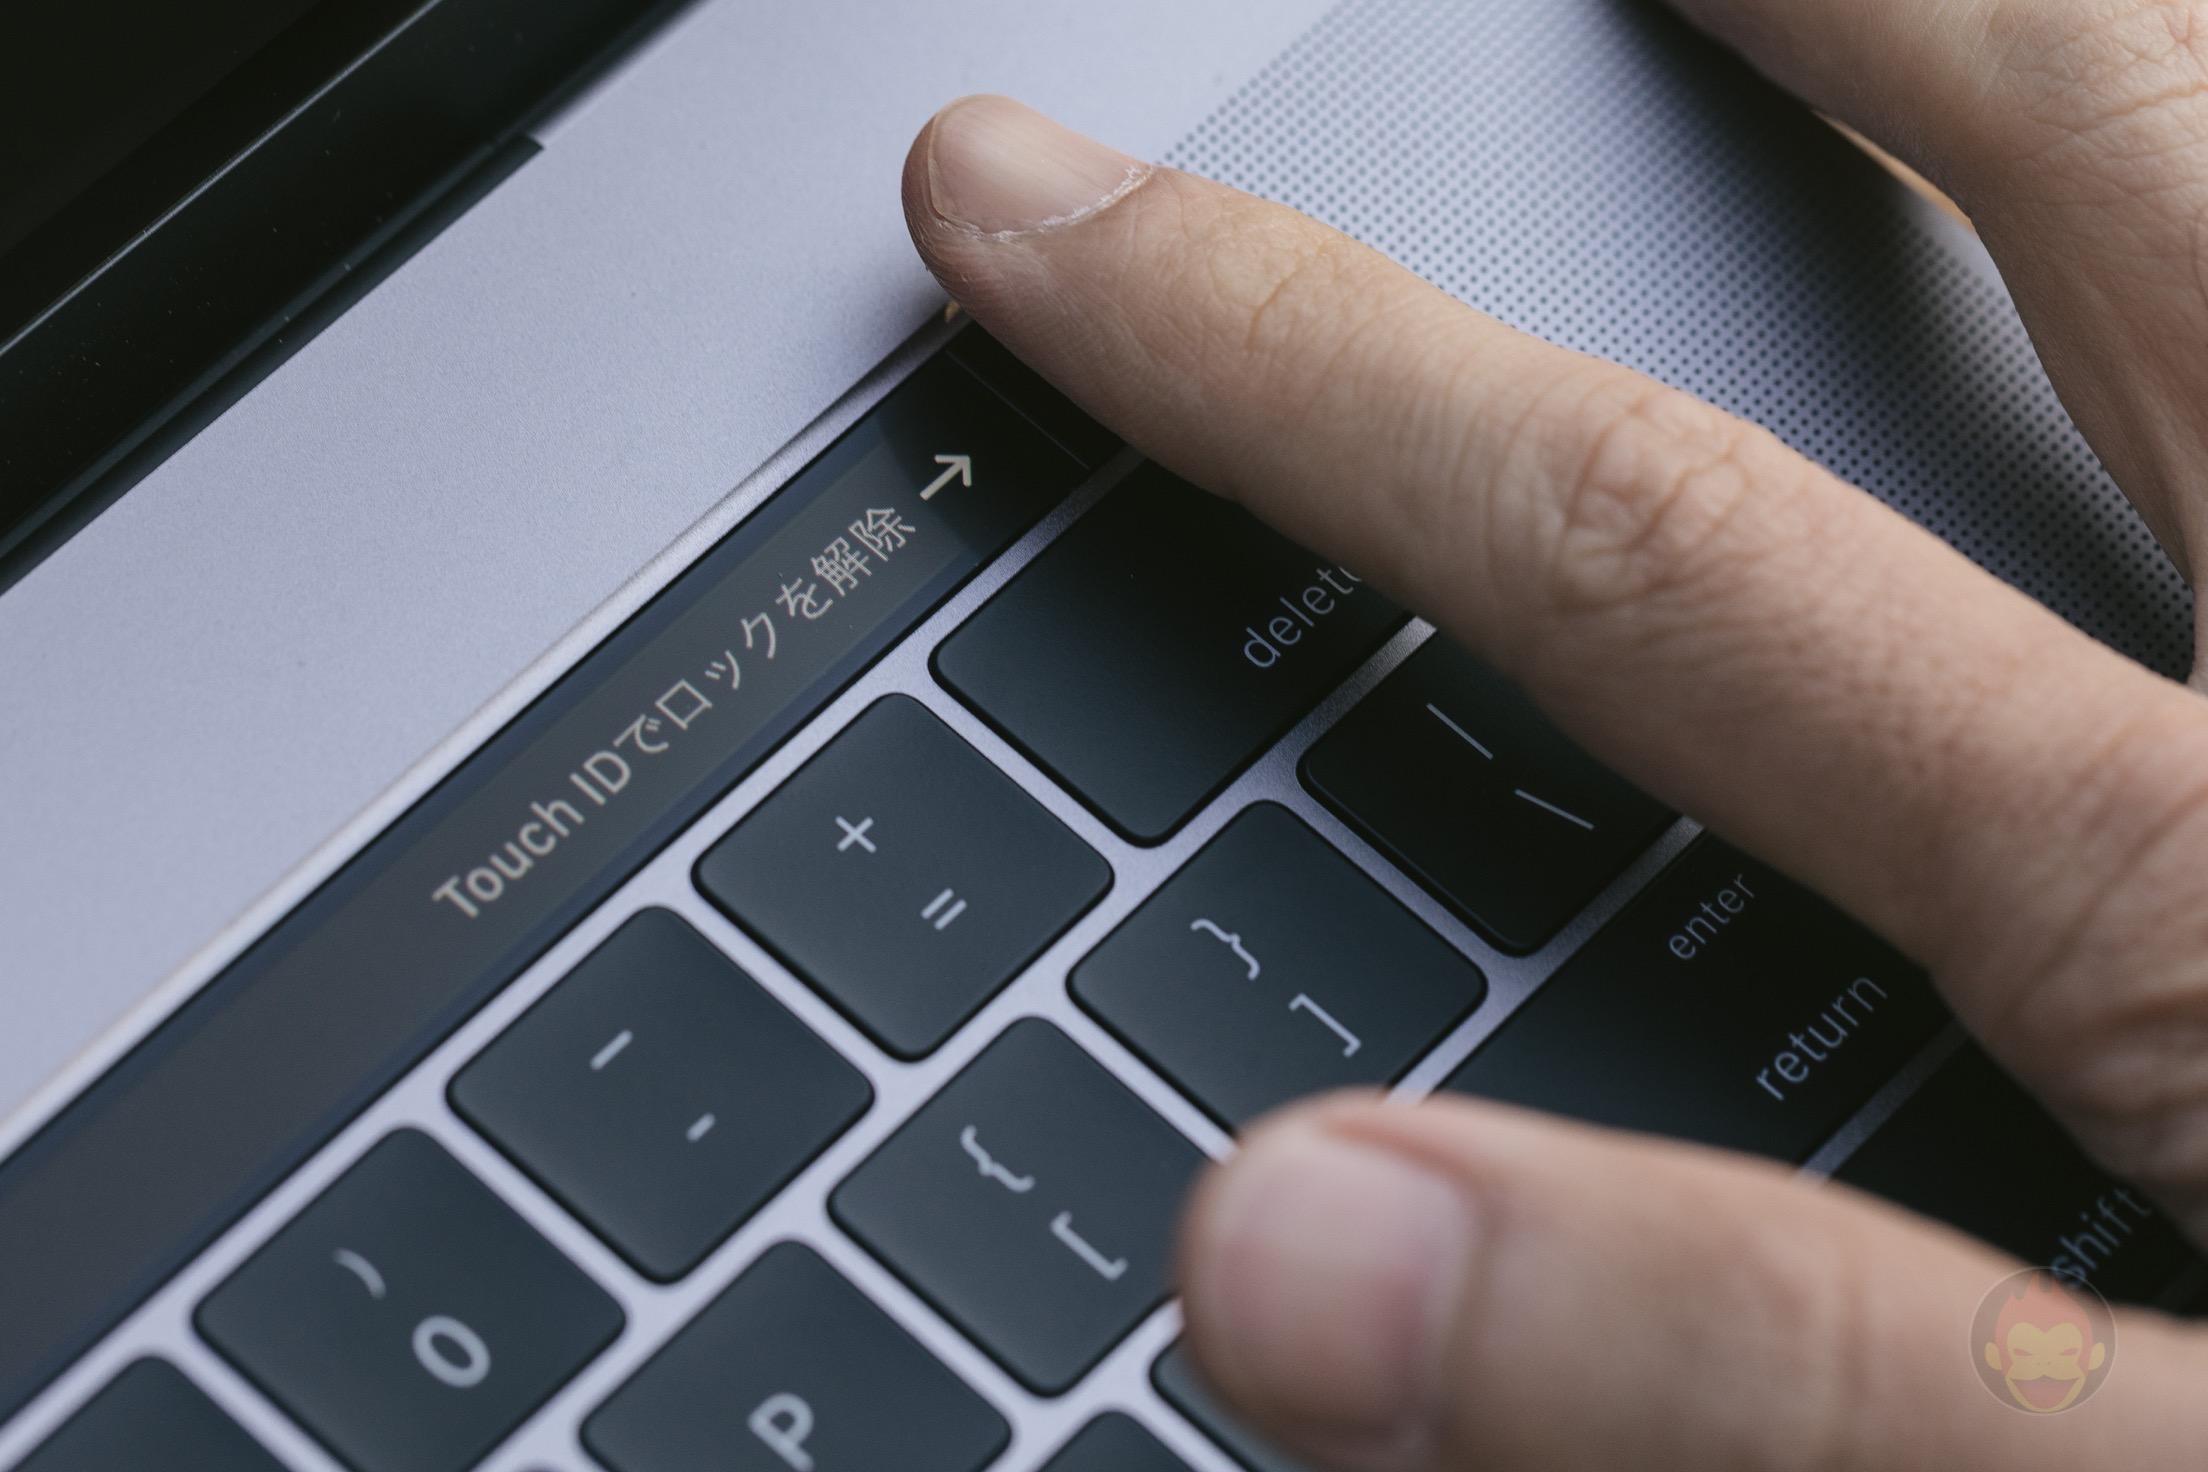 MacBook-Pro-Late2016-15inch-model-photos-11.jpg